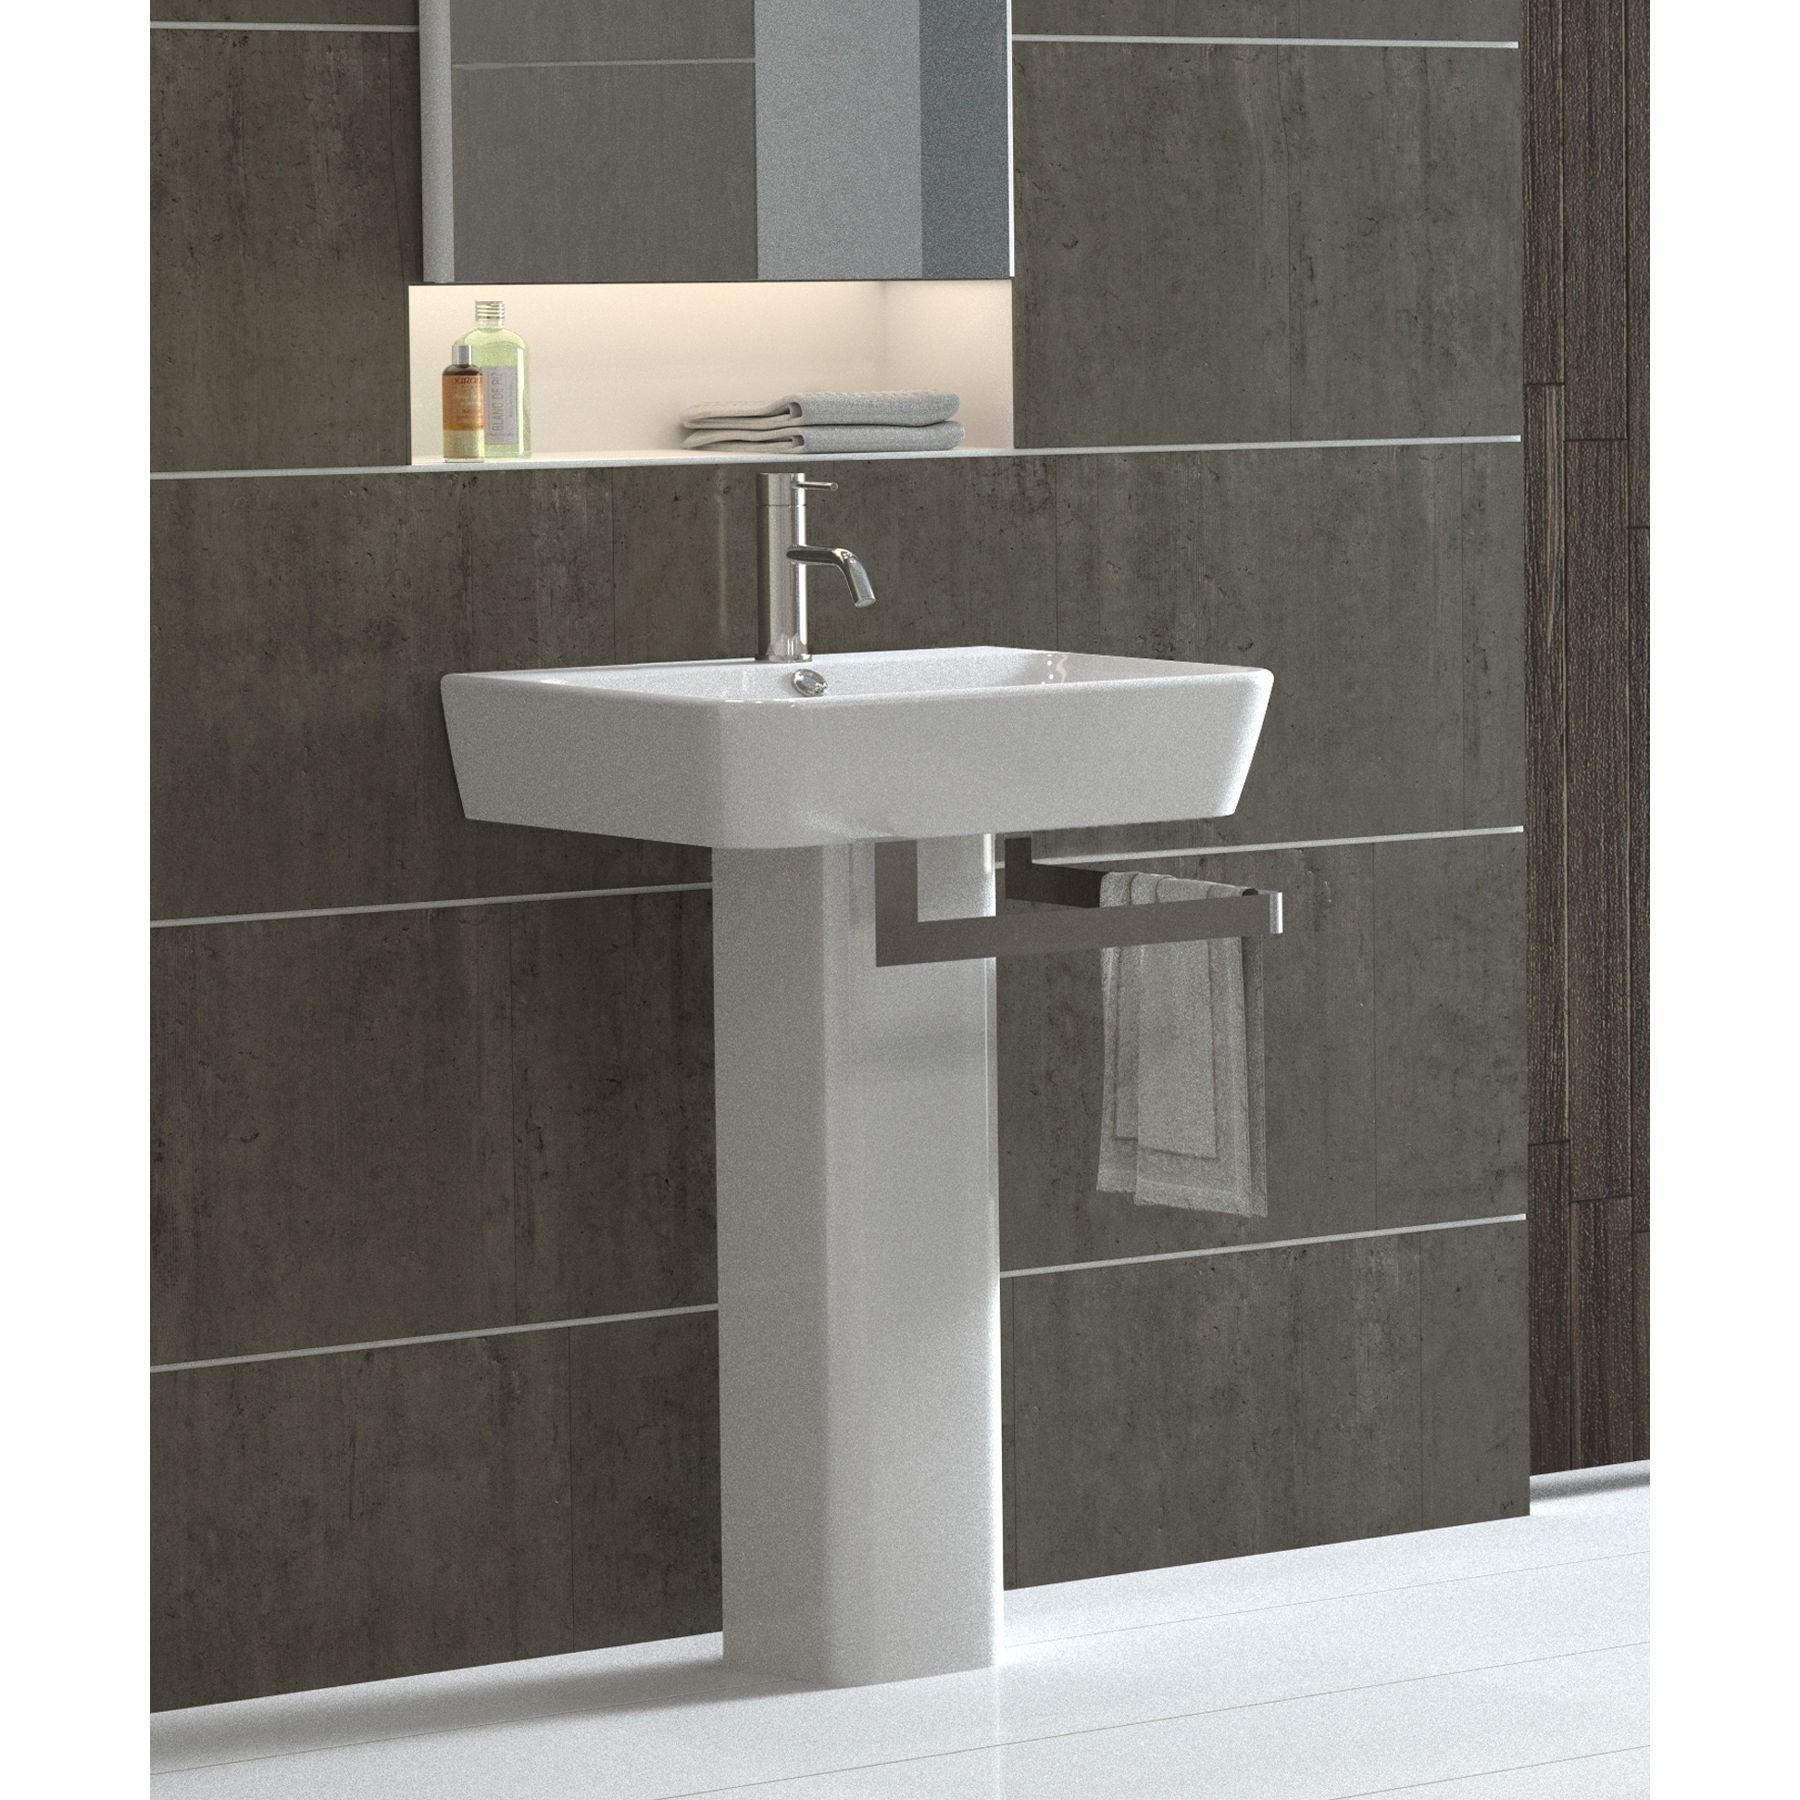 Modern Pedestal Sinks For Small Bathrooms 1